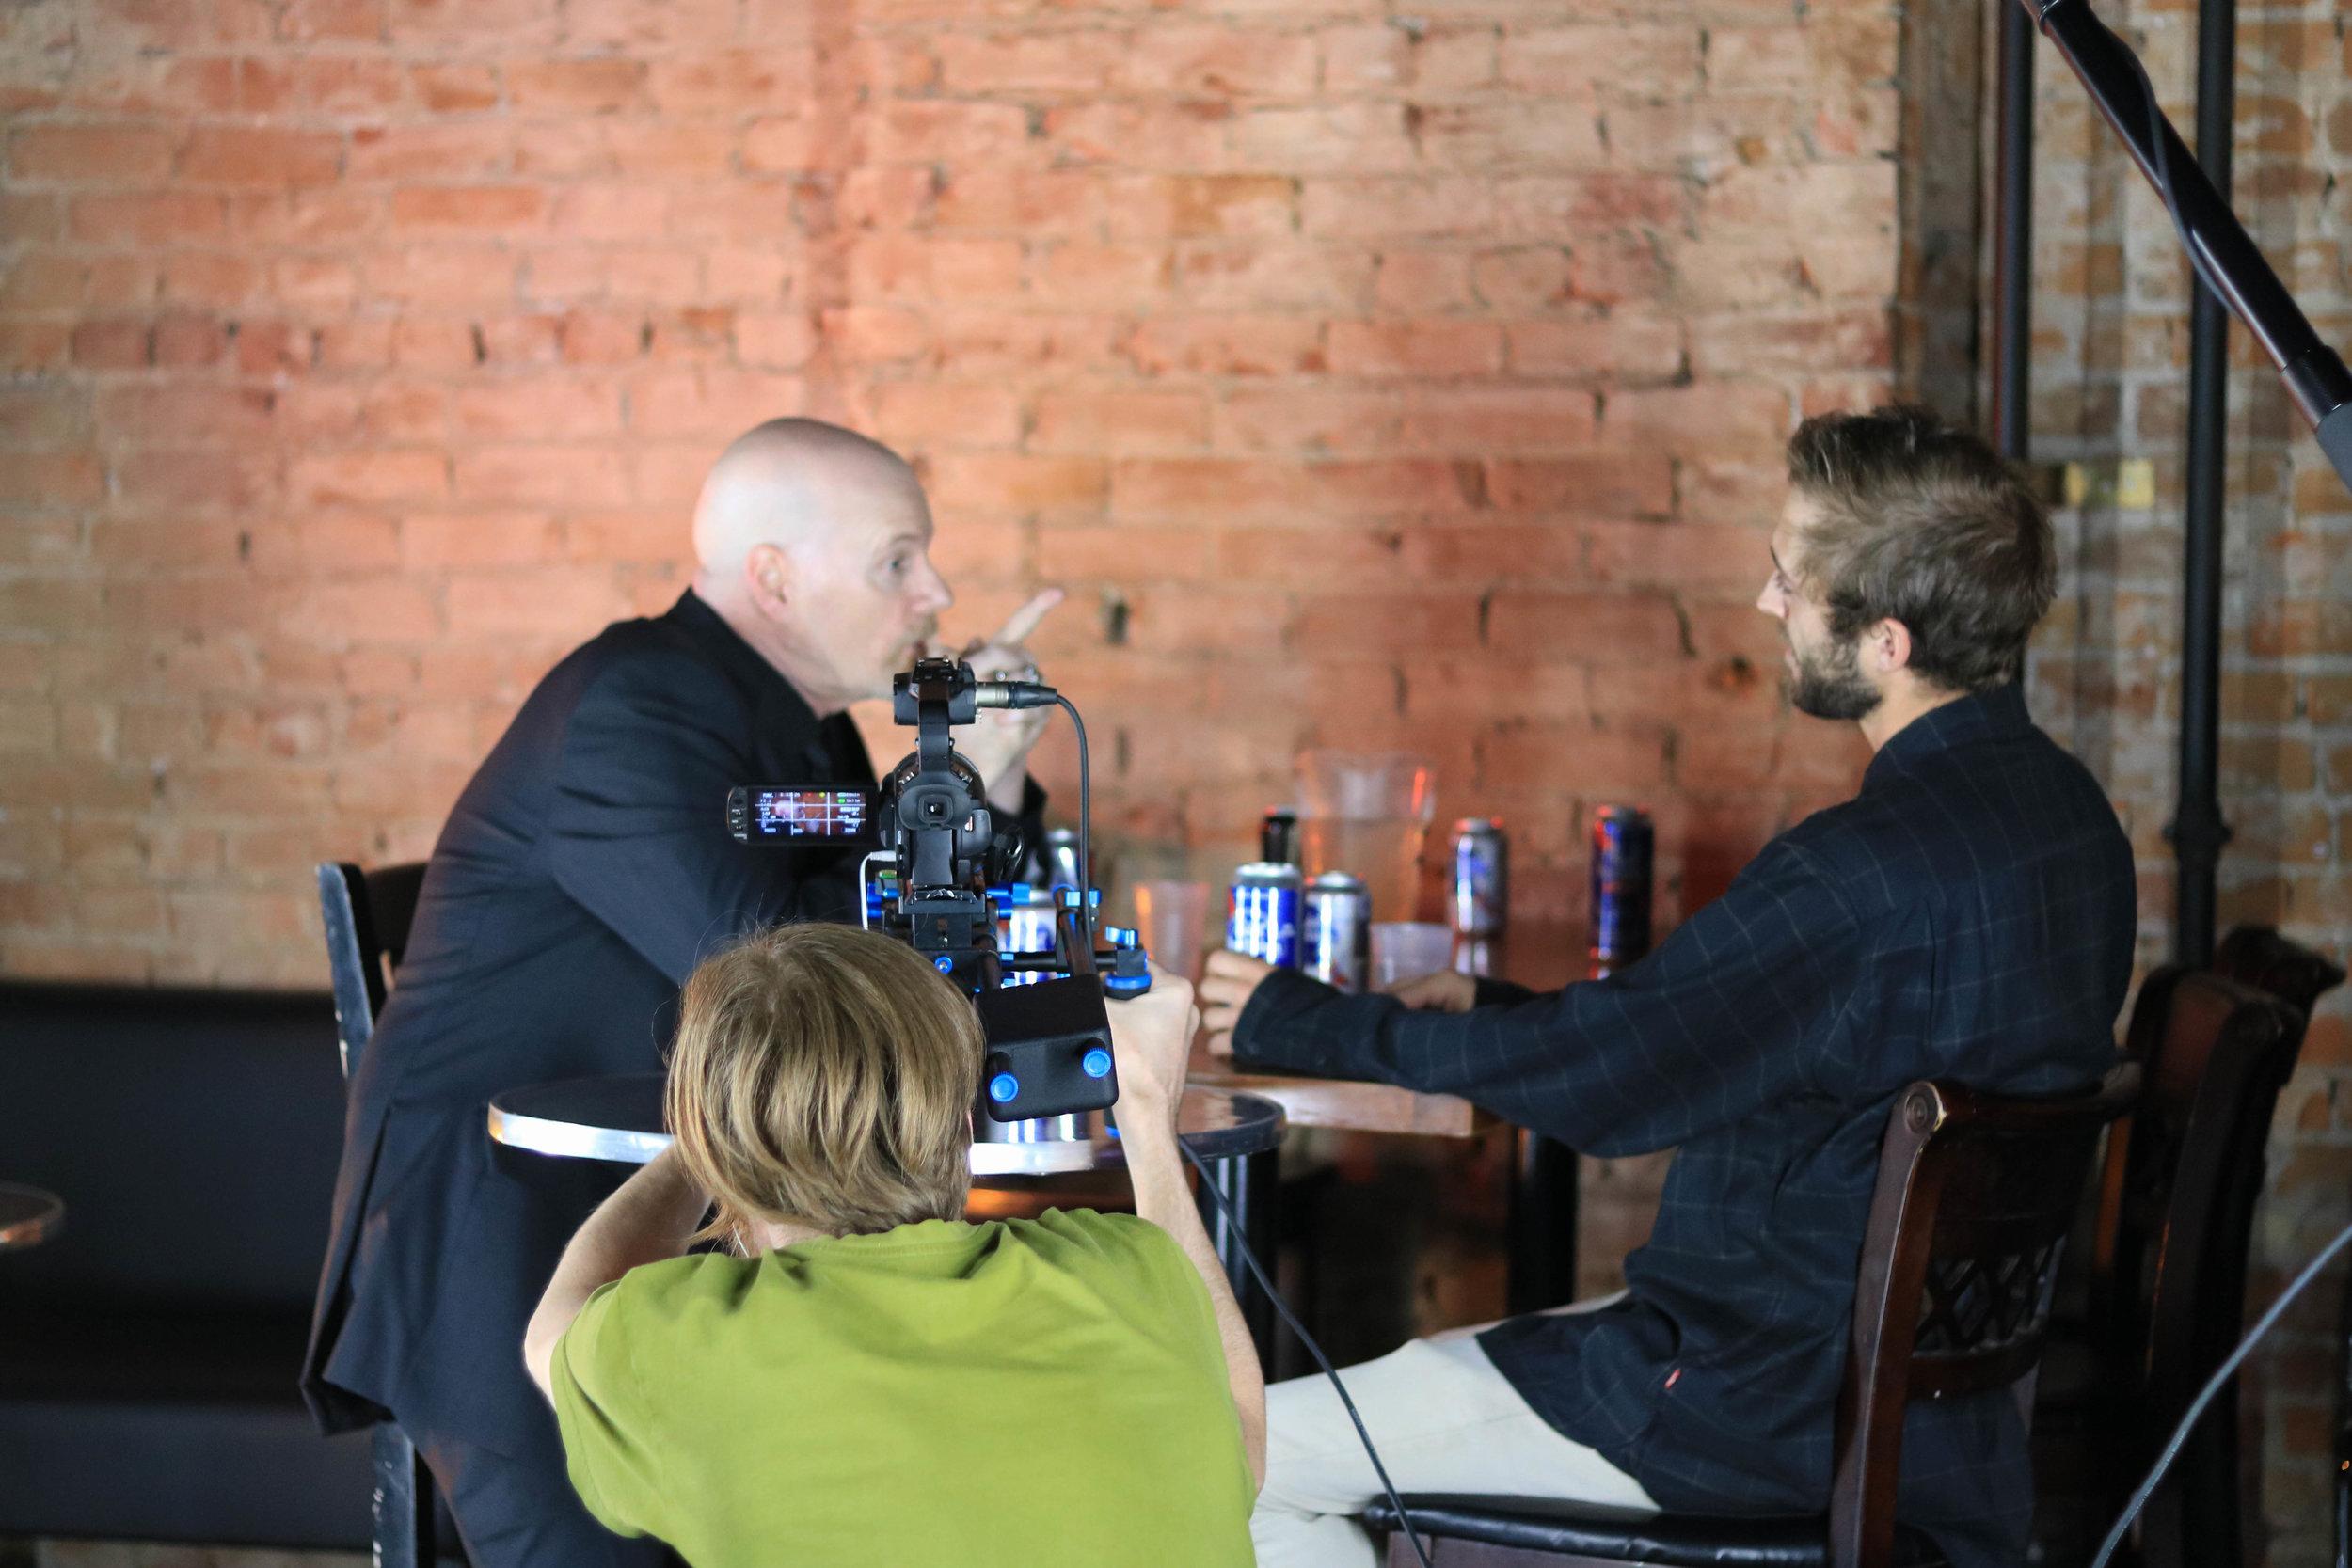 "On set of "".44"" with Cinematographer Darryl Ayles, actors David Parisian and Zachary Litt"